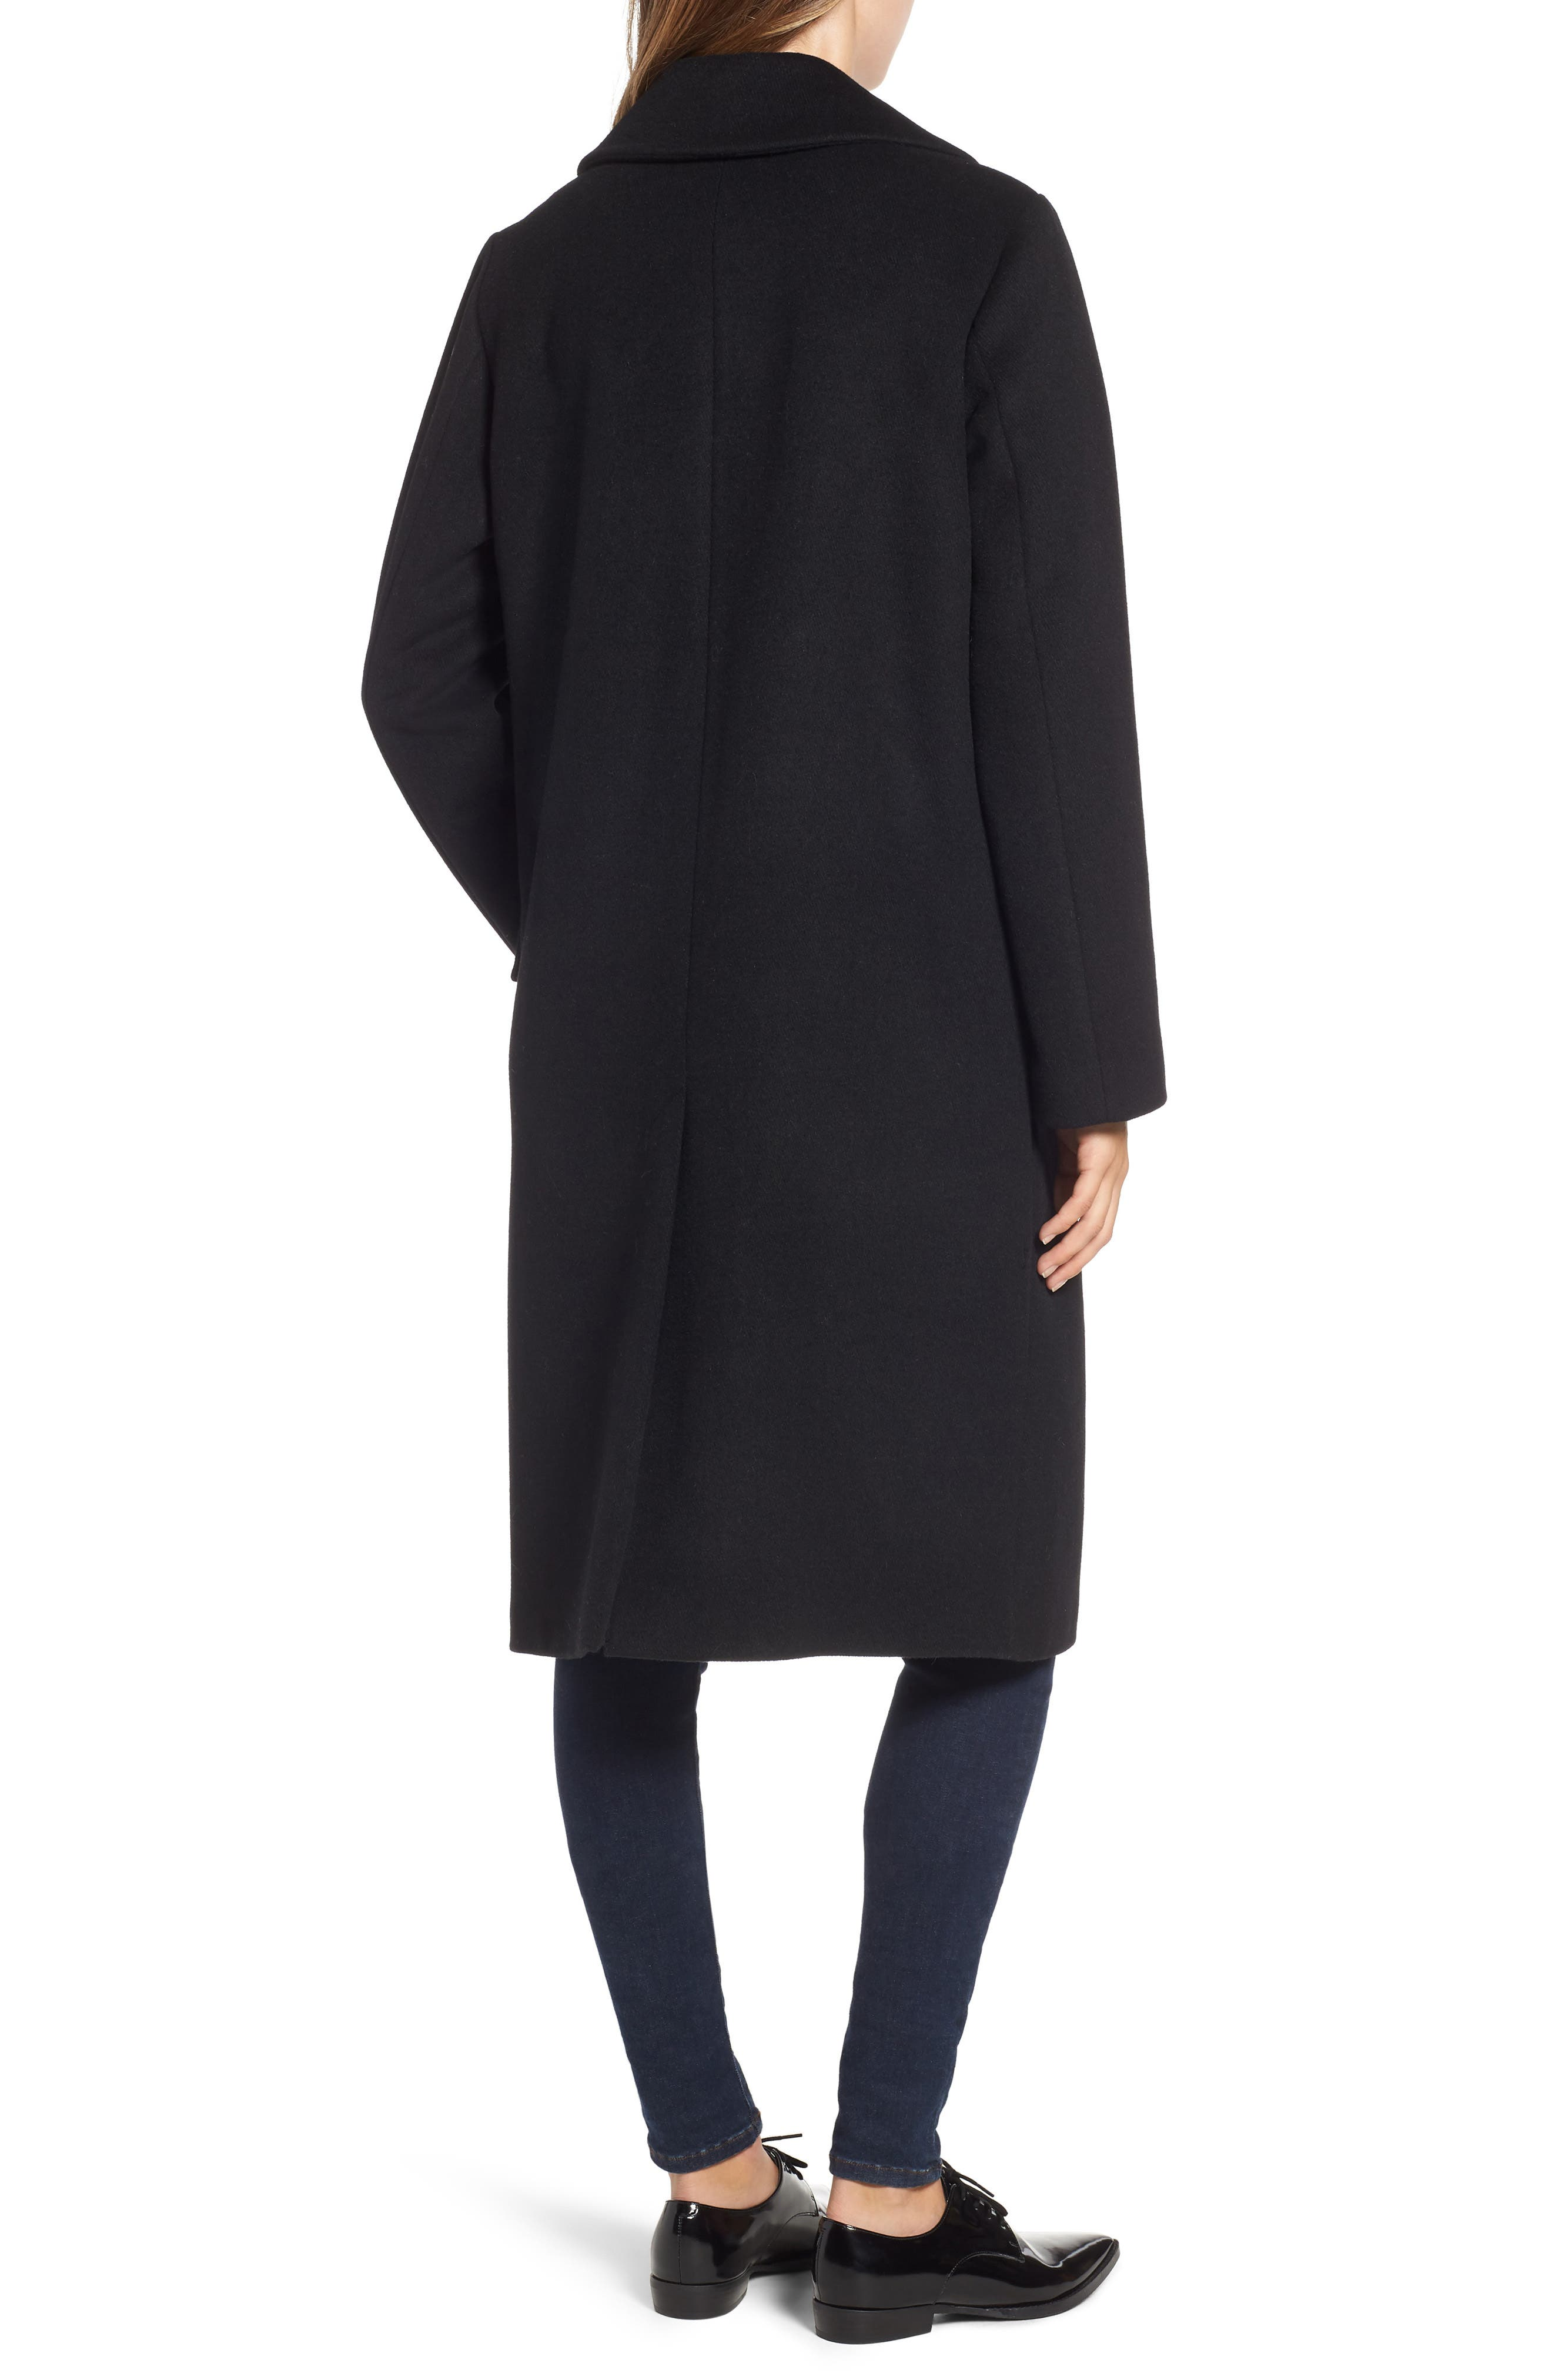 RACHEL RACHEL ROY, Wool Blend Coat, Alternate thumbnail 2, color, BLACK